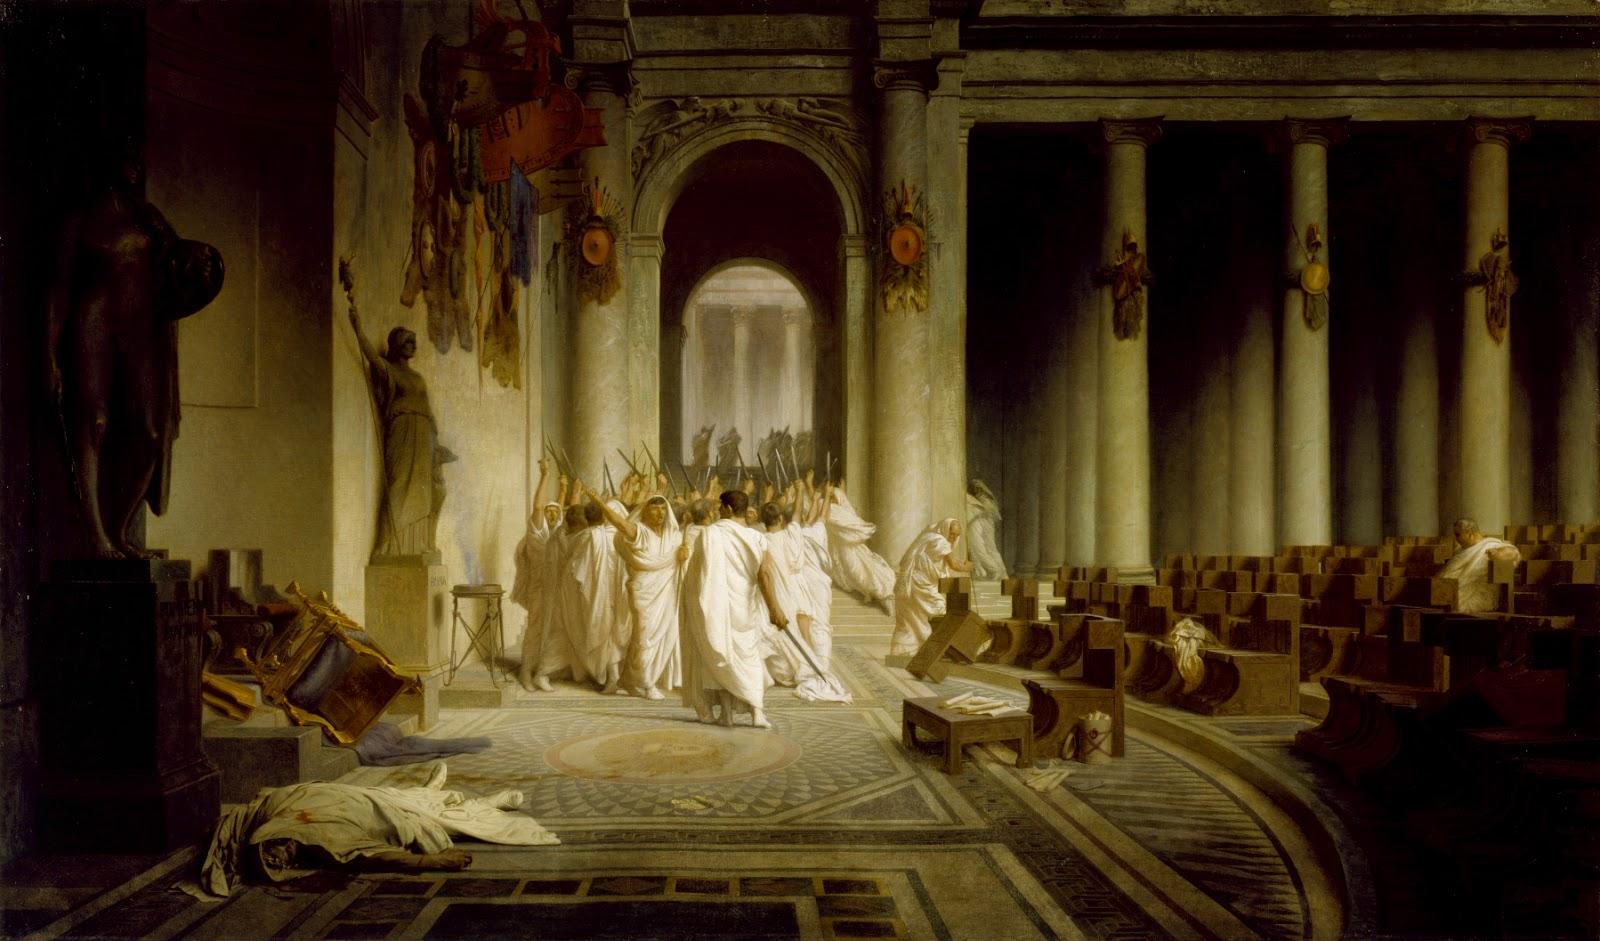 blood imagery in shakespears julius ceasar essay